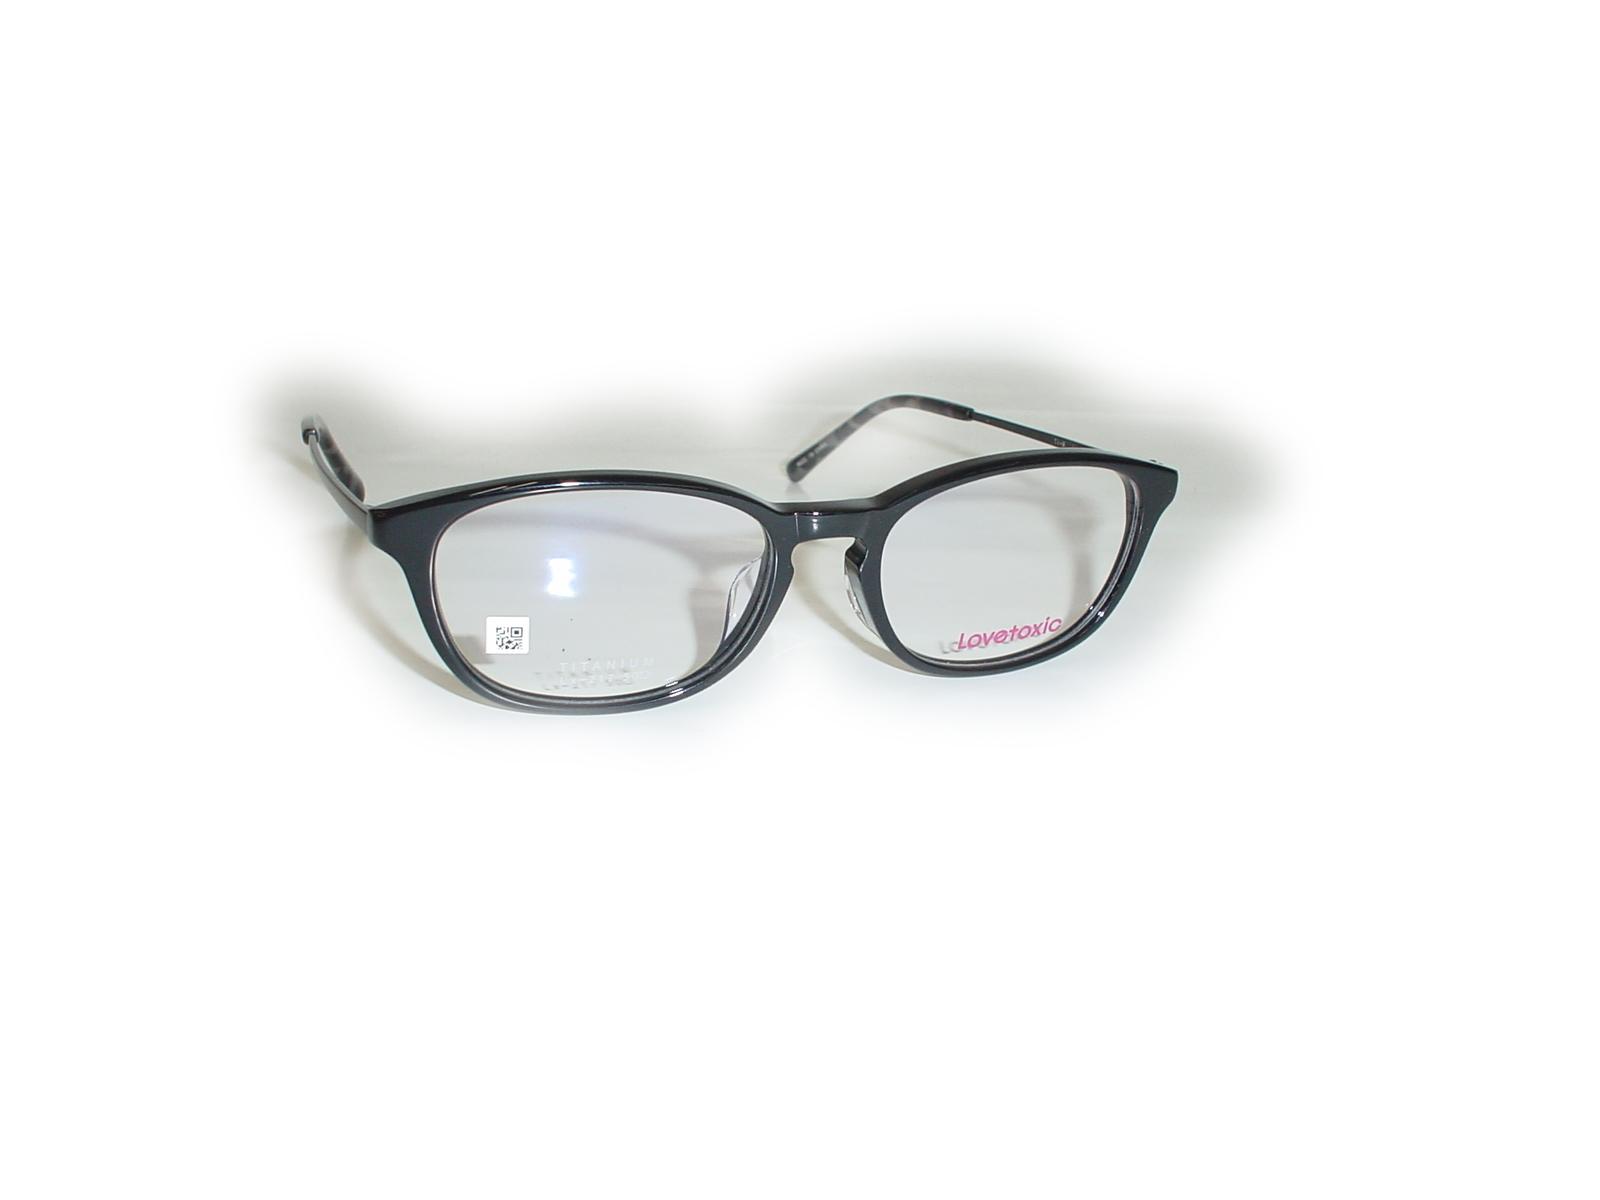 ★Lovetoxic(ラブトキシック)★Lx-21750□17-137COL.4 BK超薄型非球面レンズ付